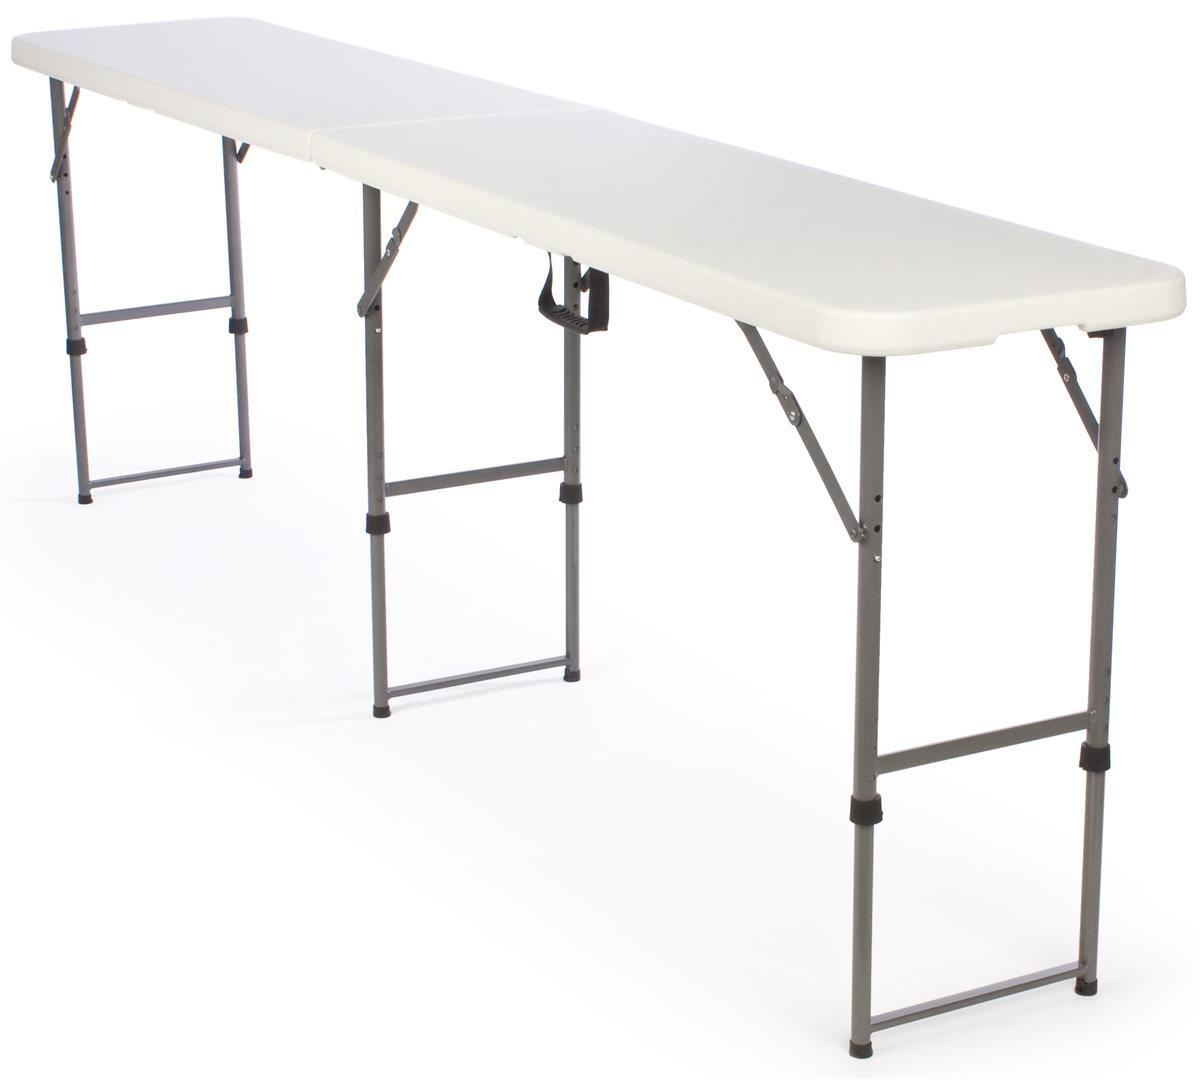 Folding Tables Adjustable Height Plastic Top